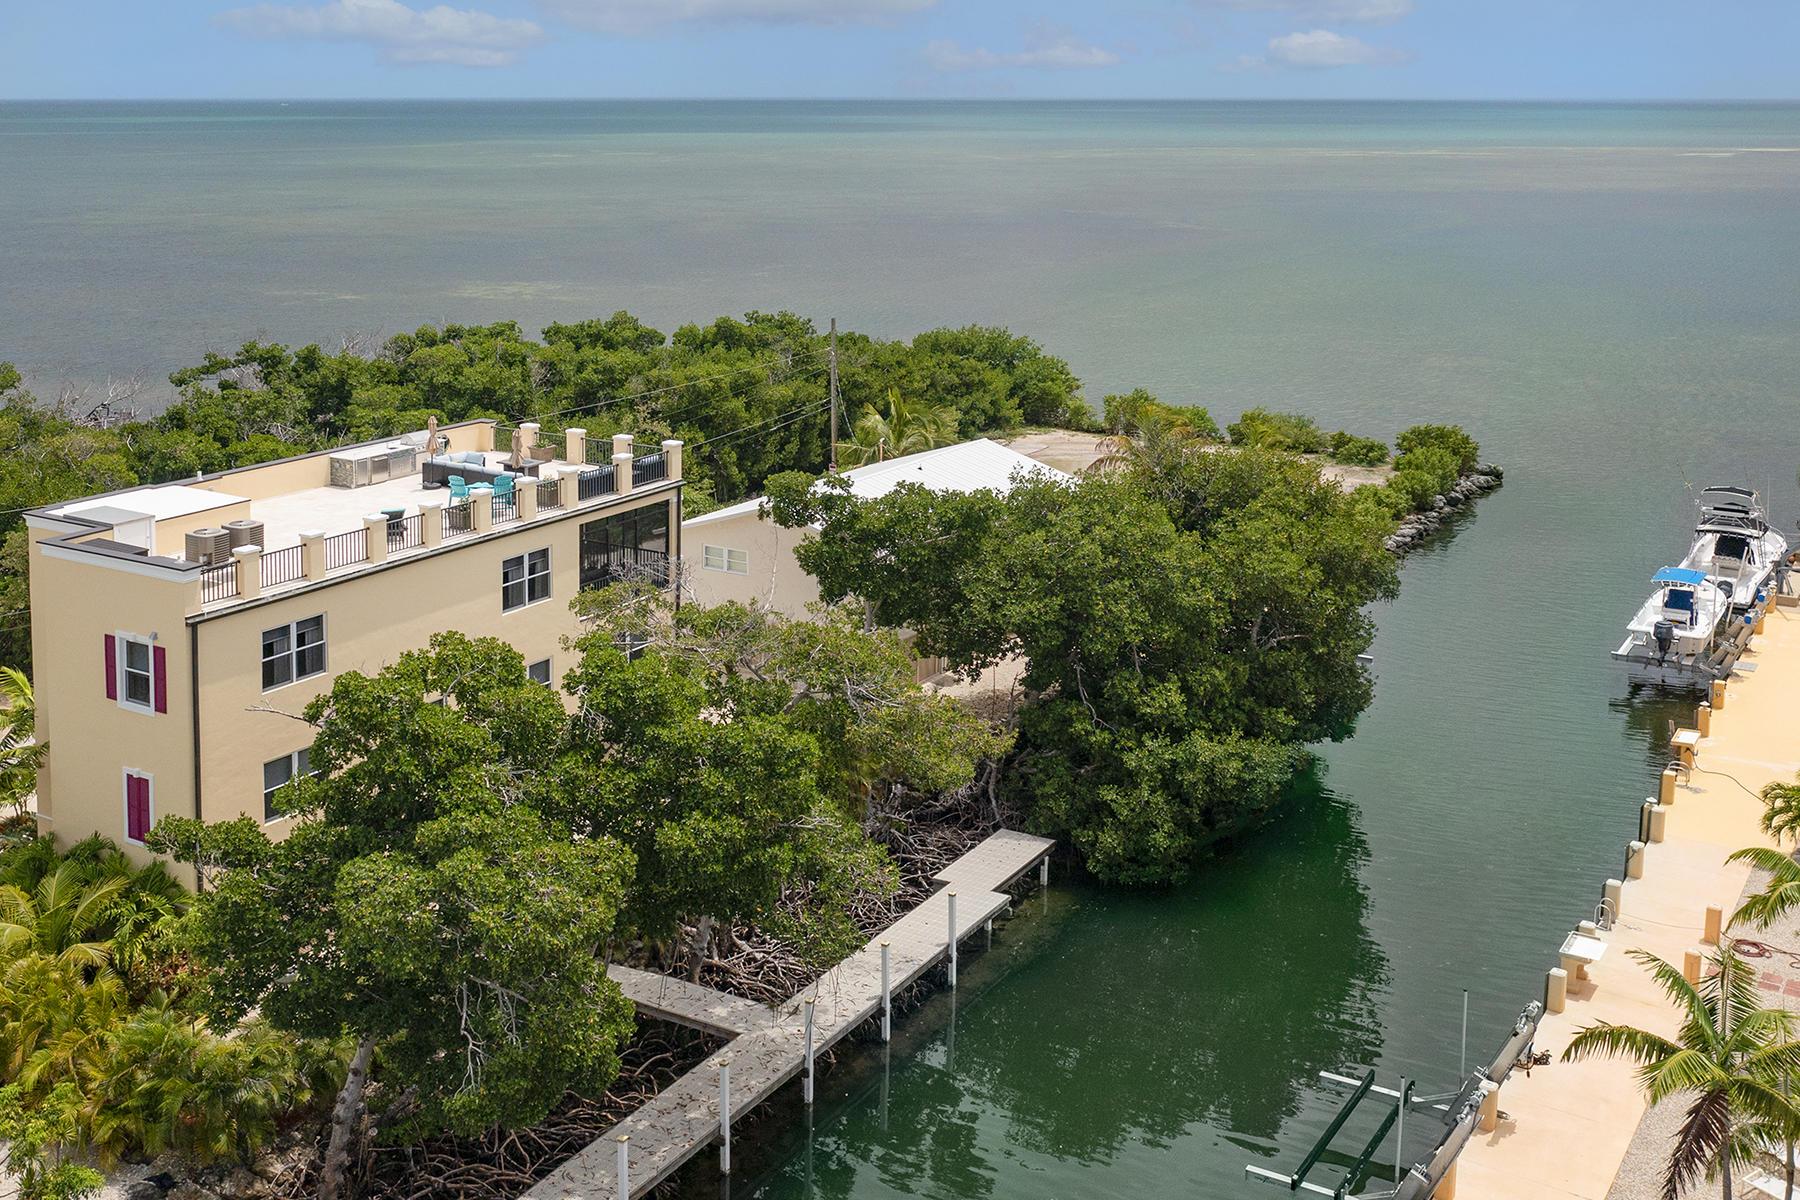 1100 E 63rd Street Ocean Property Photo 1